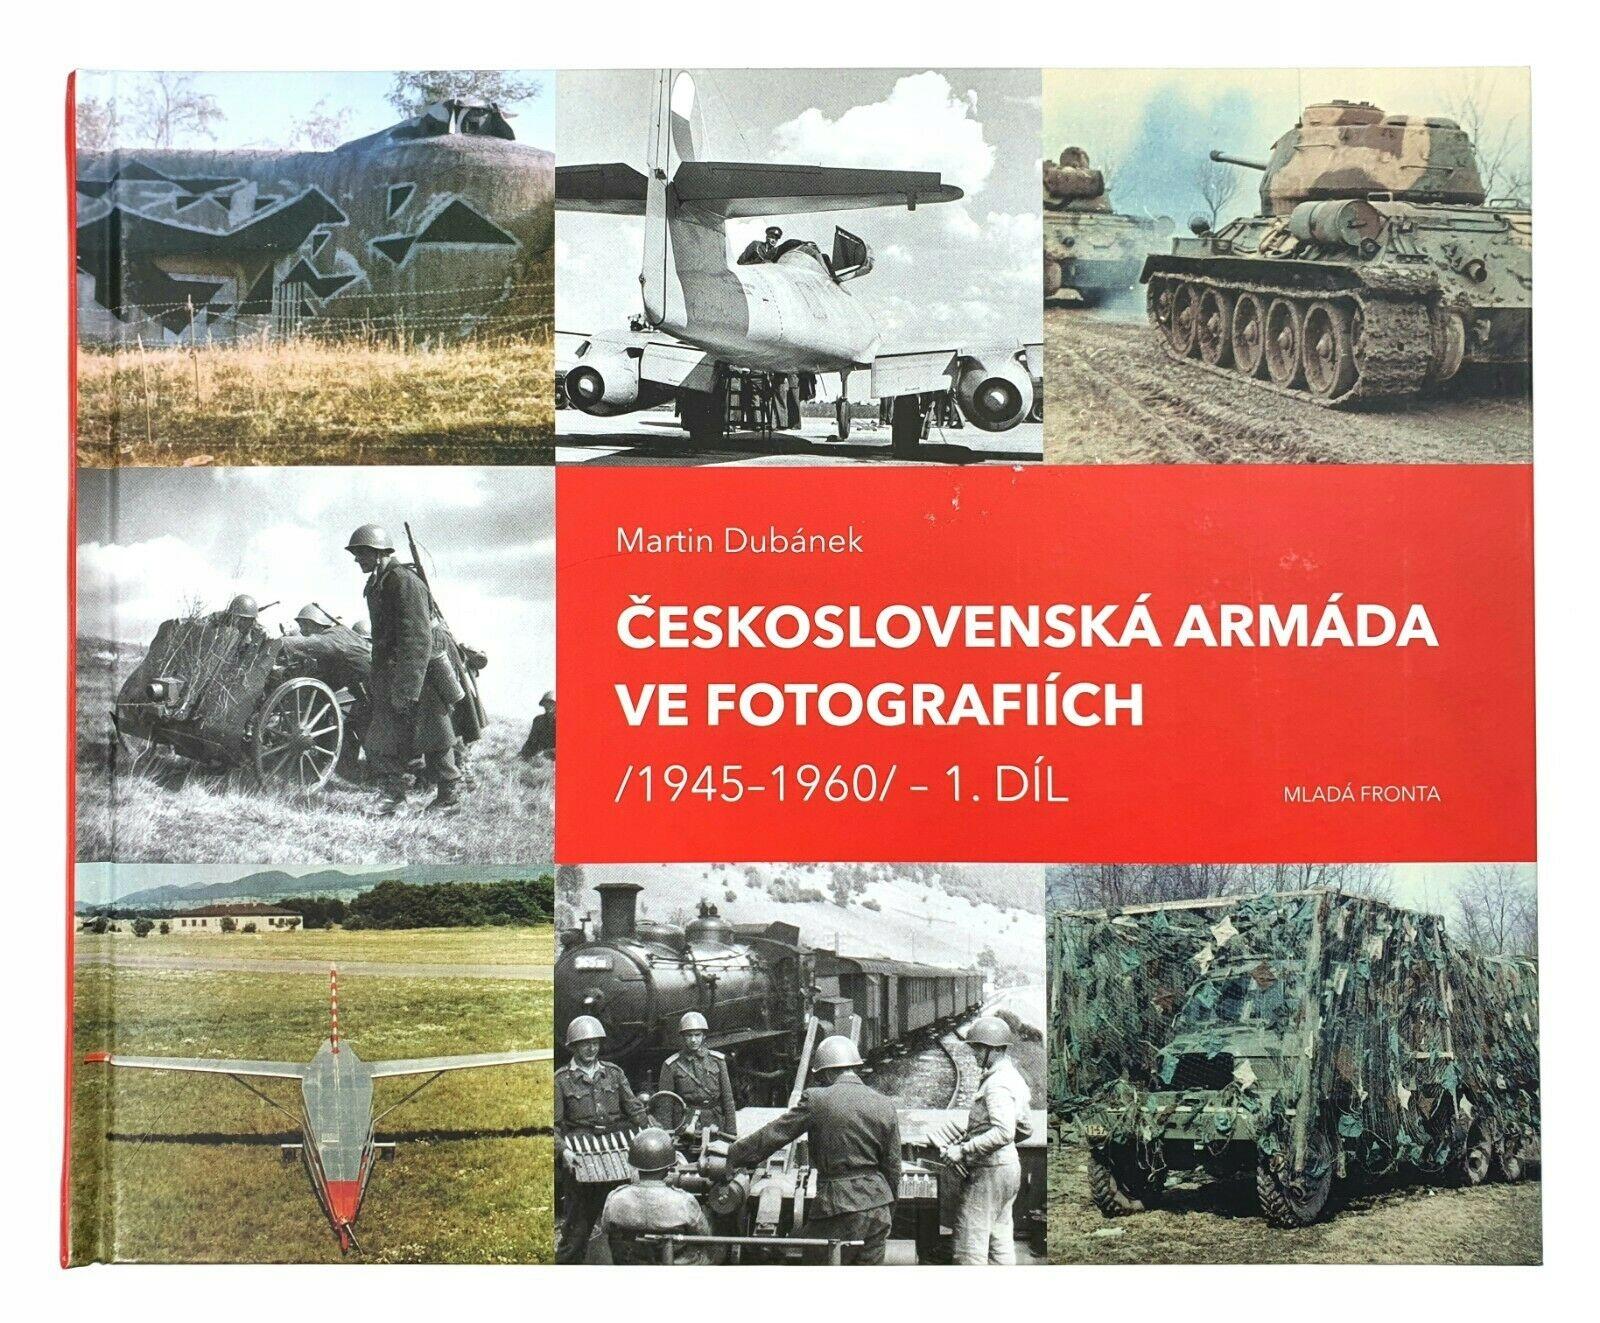 Чехословацкая армия в фотографиях 1945-1960 г.г.